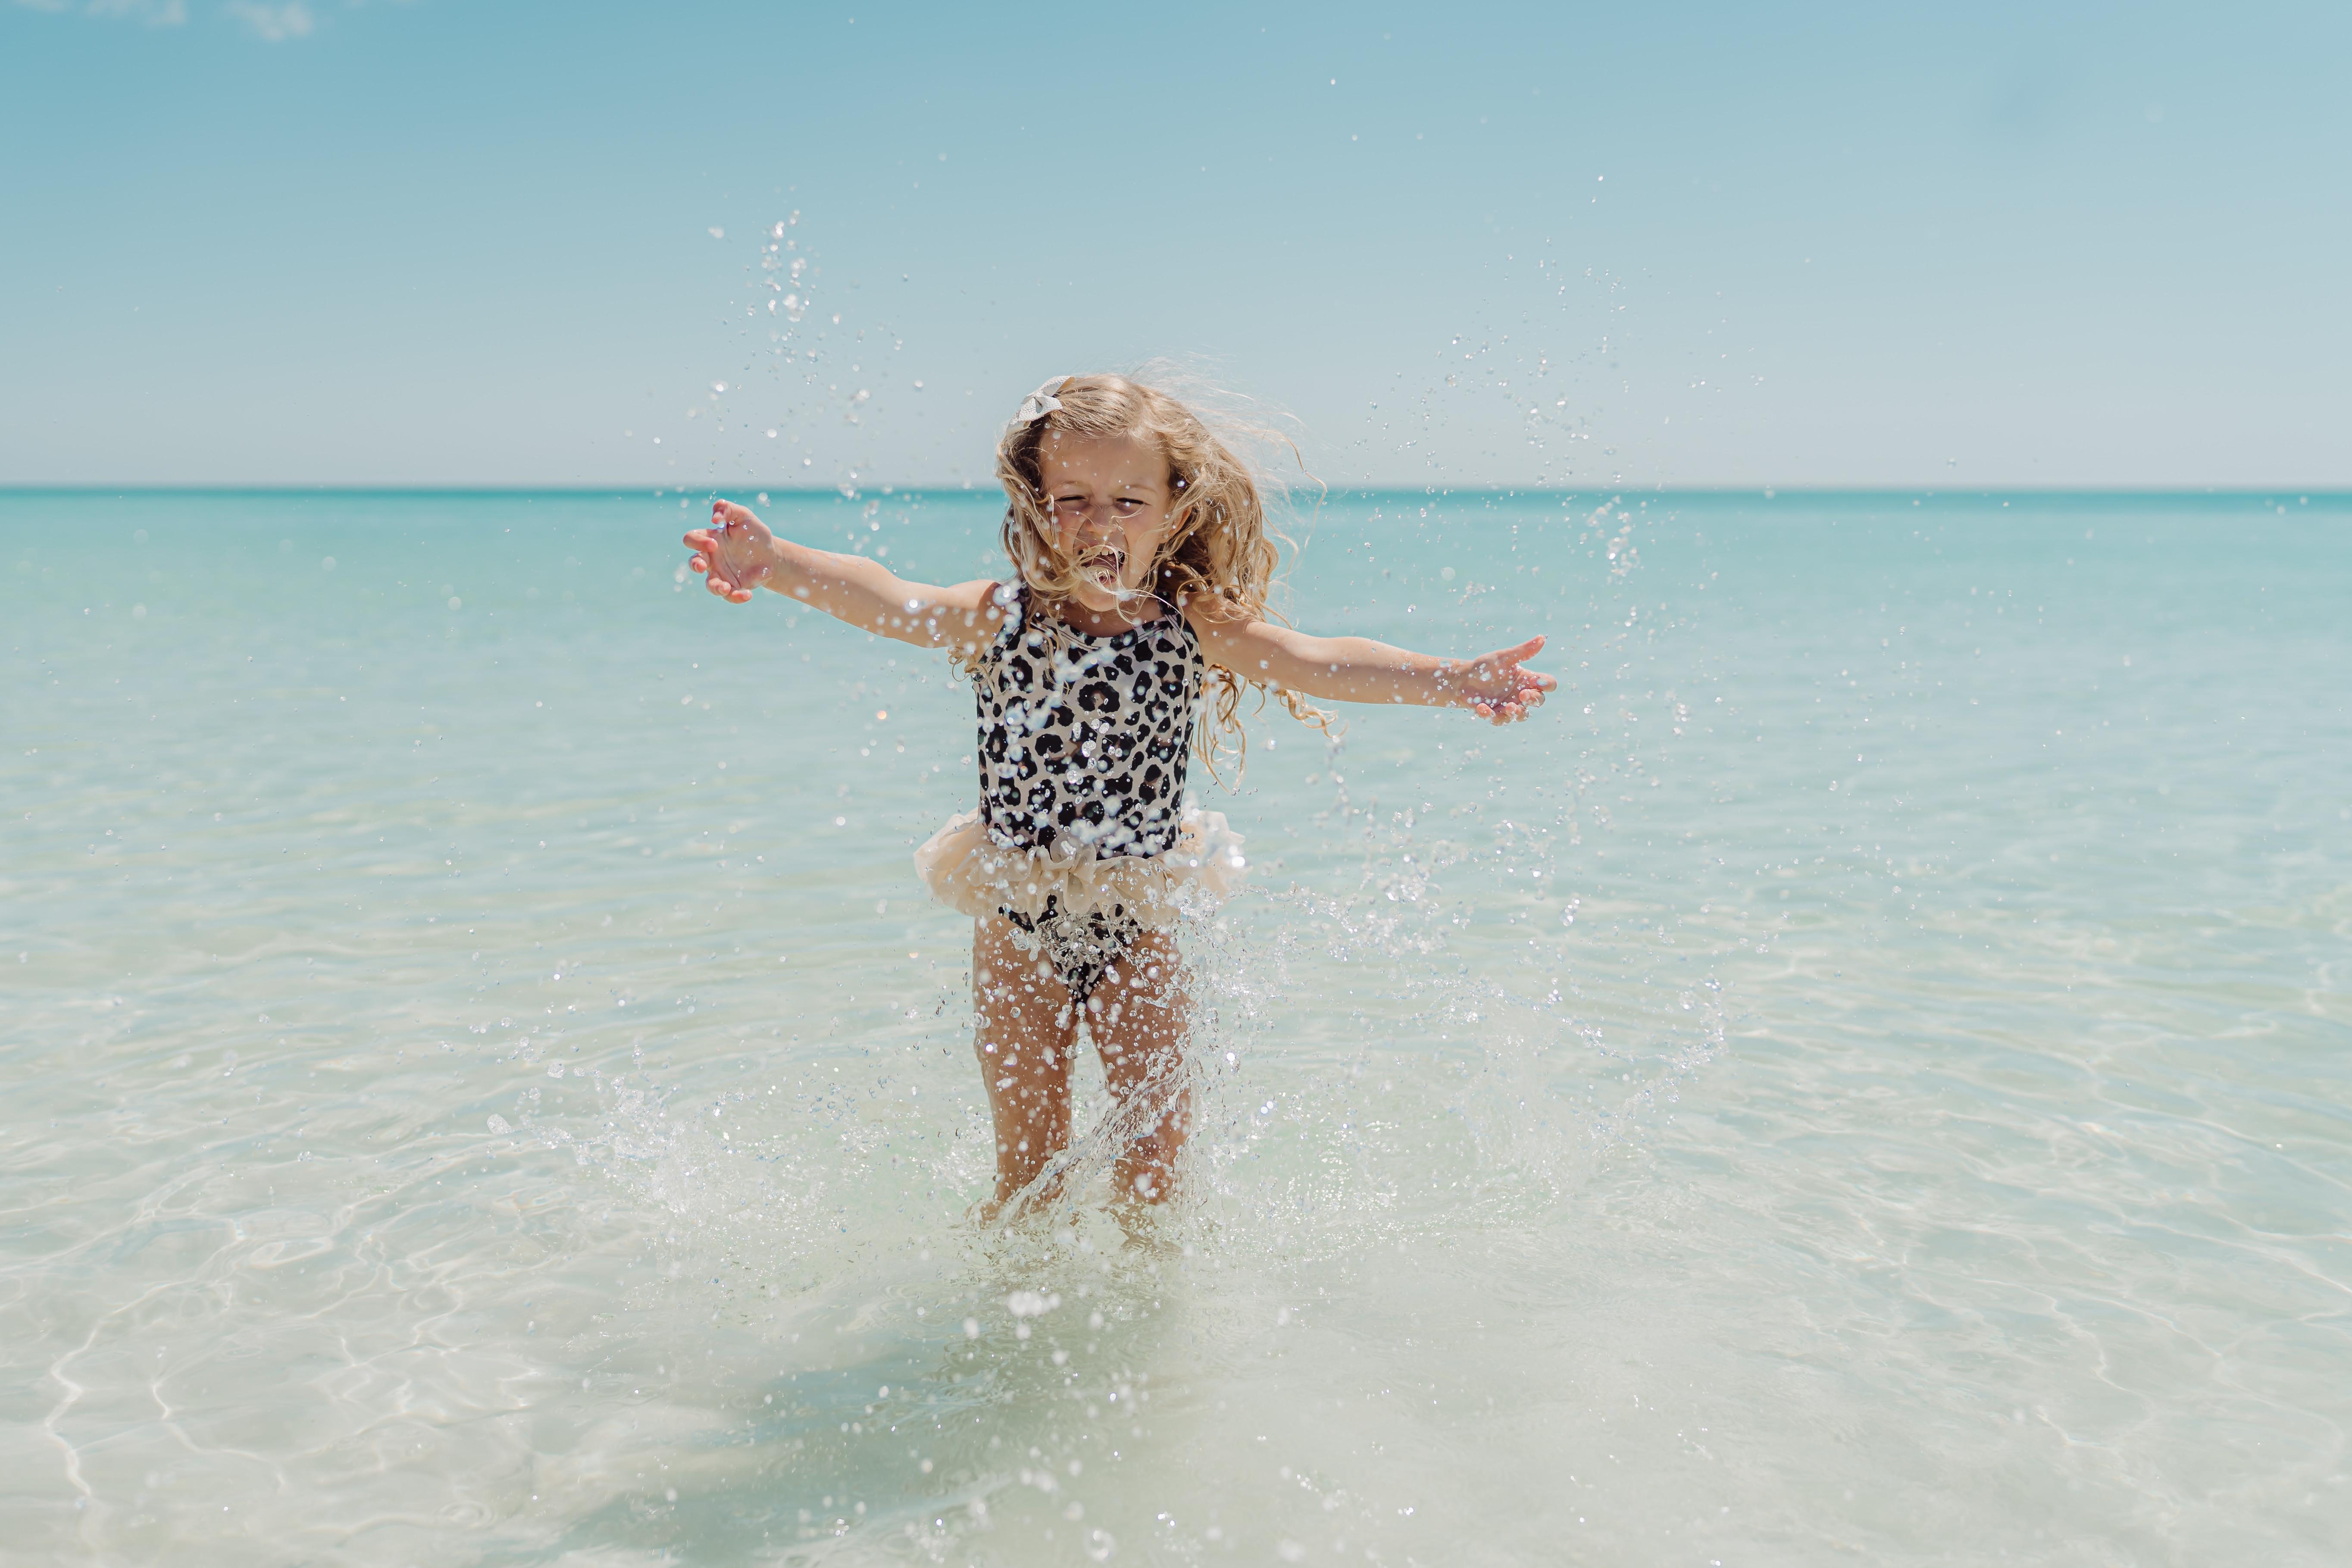 Beach Day MINI add on